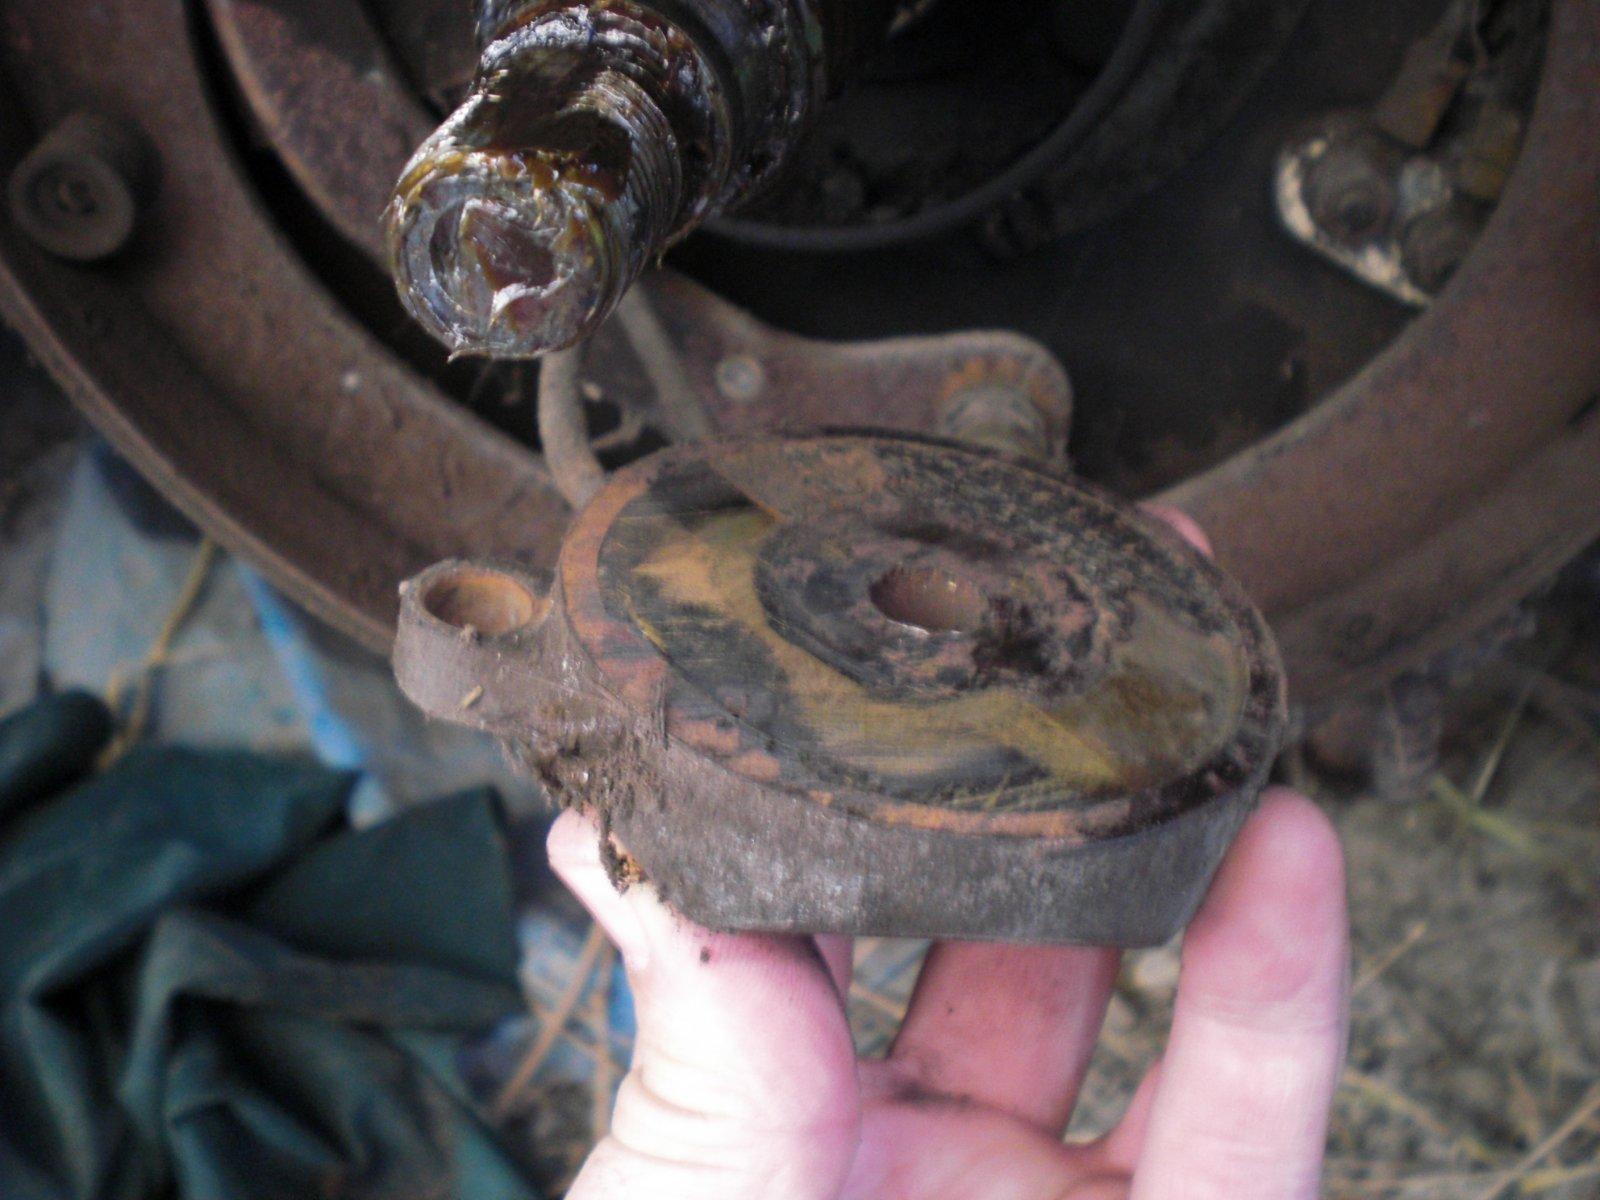 Click image for larger version  Name:brake parts1.jpg Views:80 Size:221.5 KB ID:73663